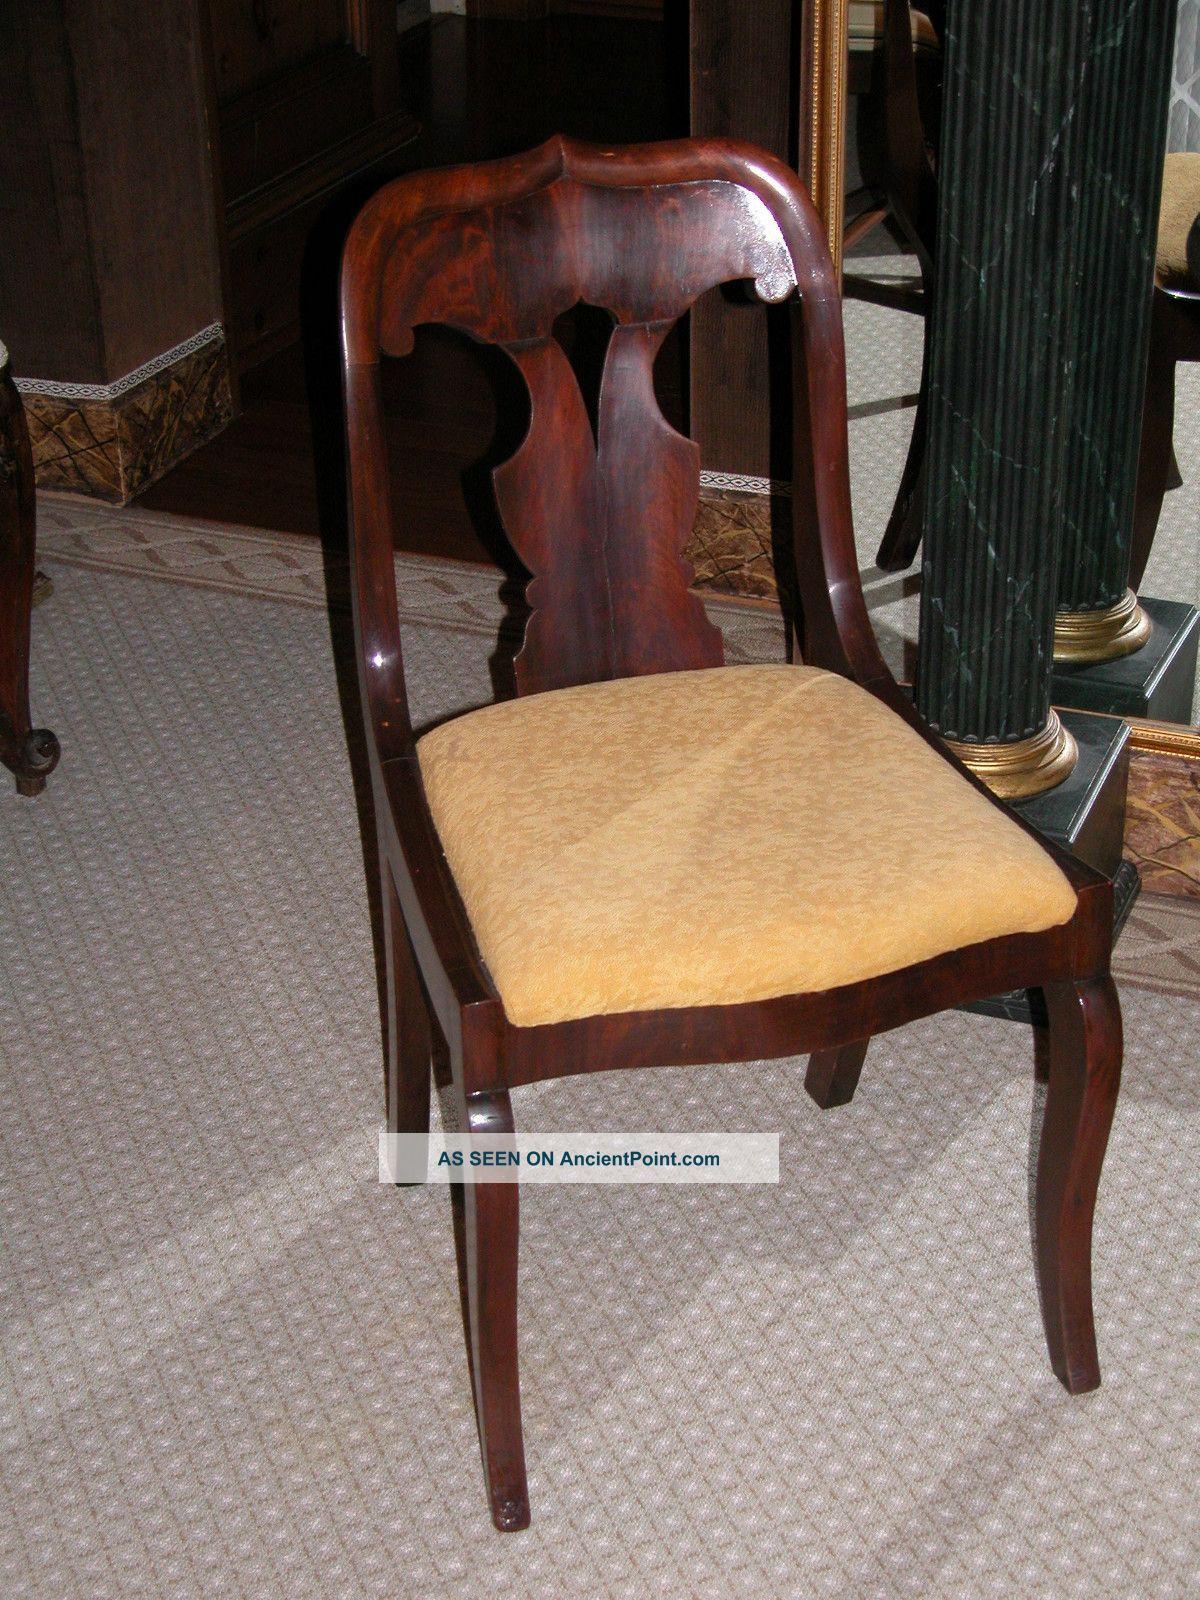 Mahogany American Empire Side Chair W Crotch Mahogany Back 1800-1899 photo